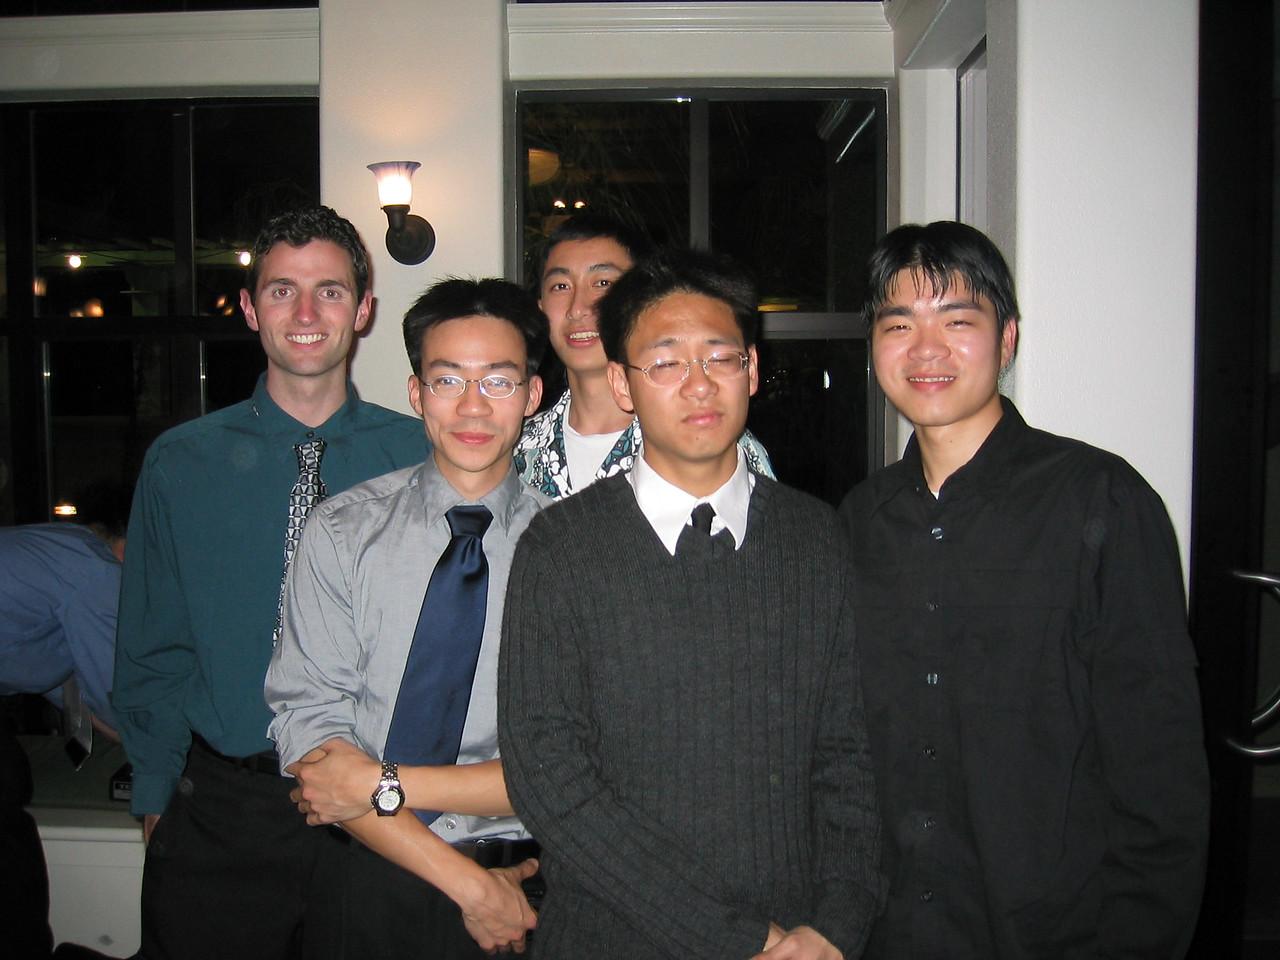 Fall '02 Guys small group - Luke, Ben, Jason, Phil, & Andy Chang